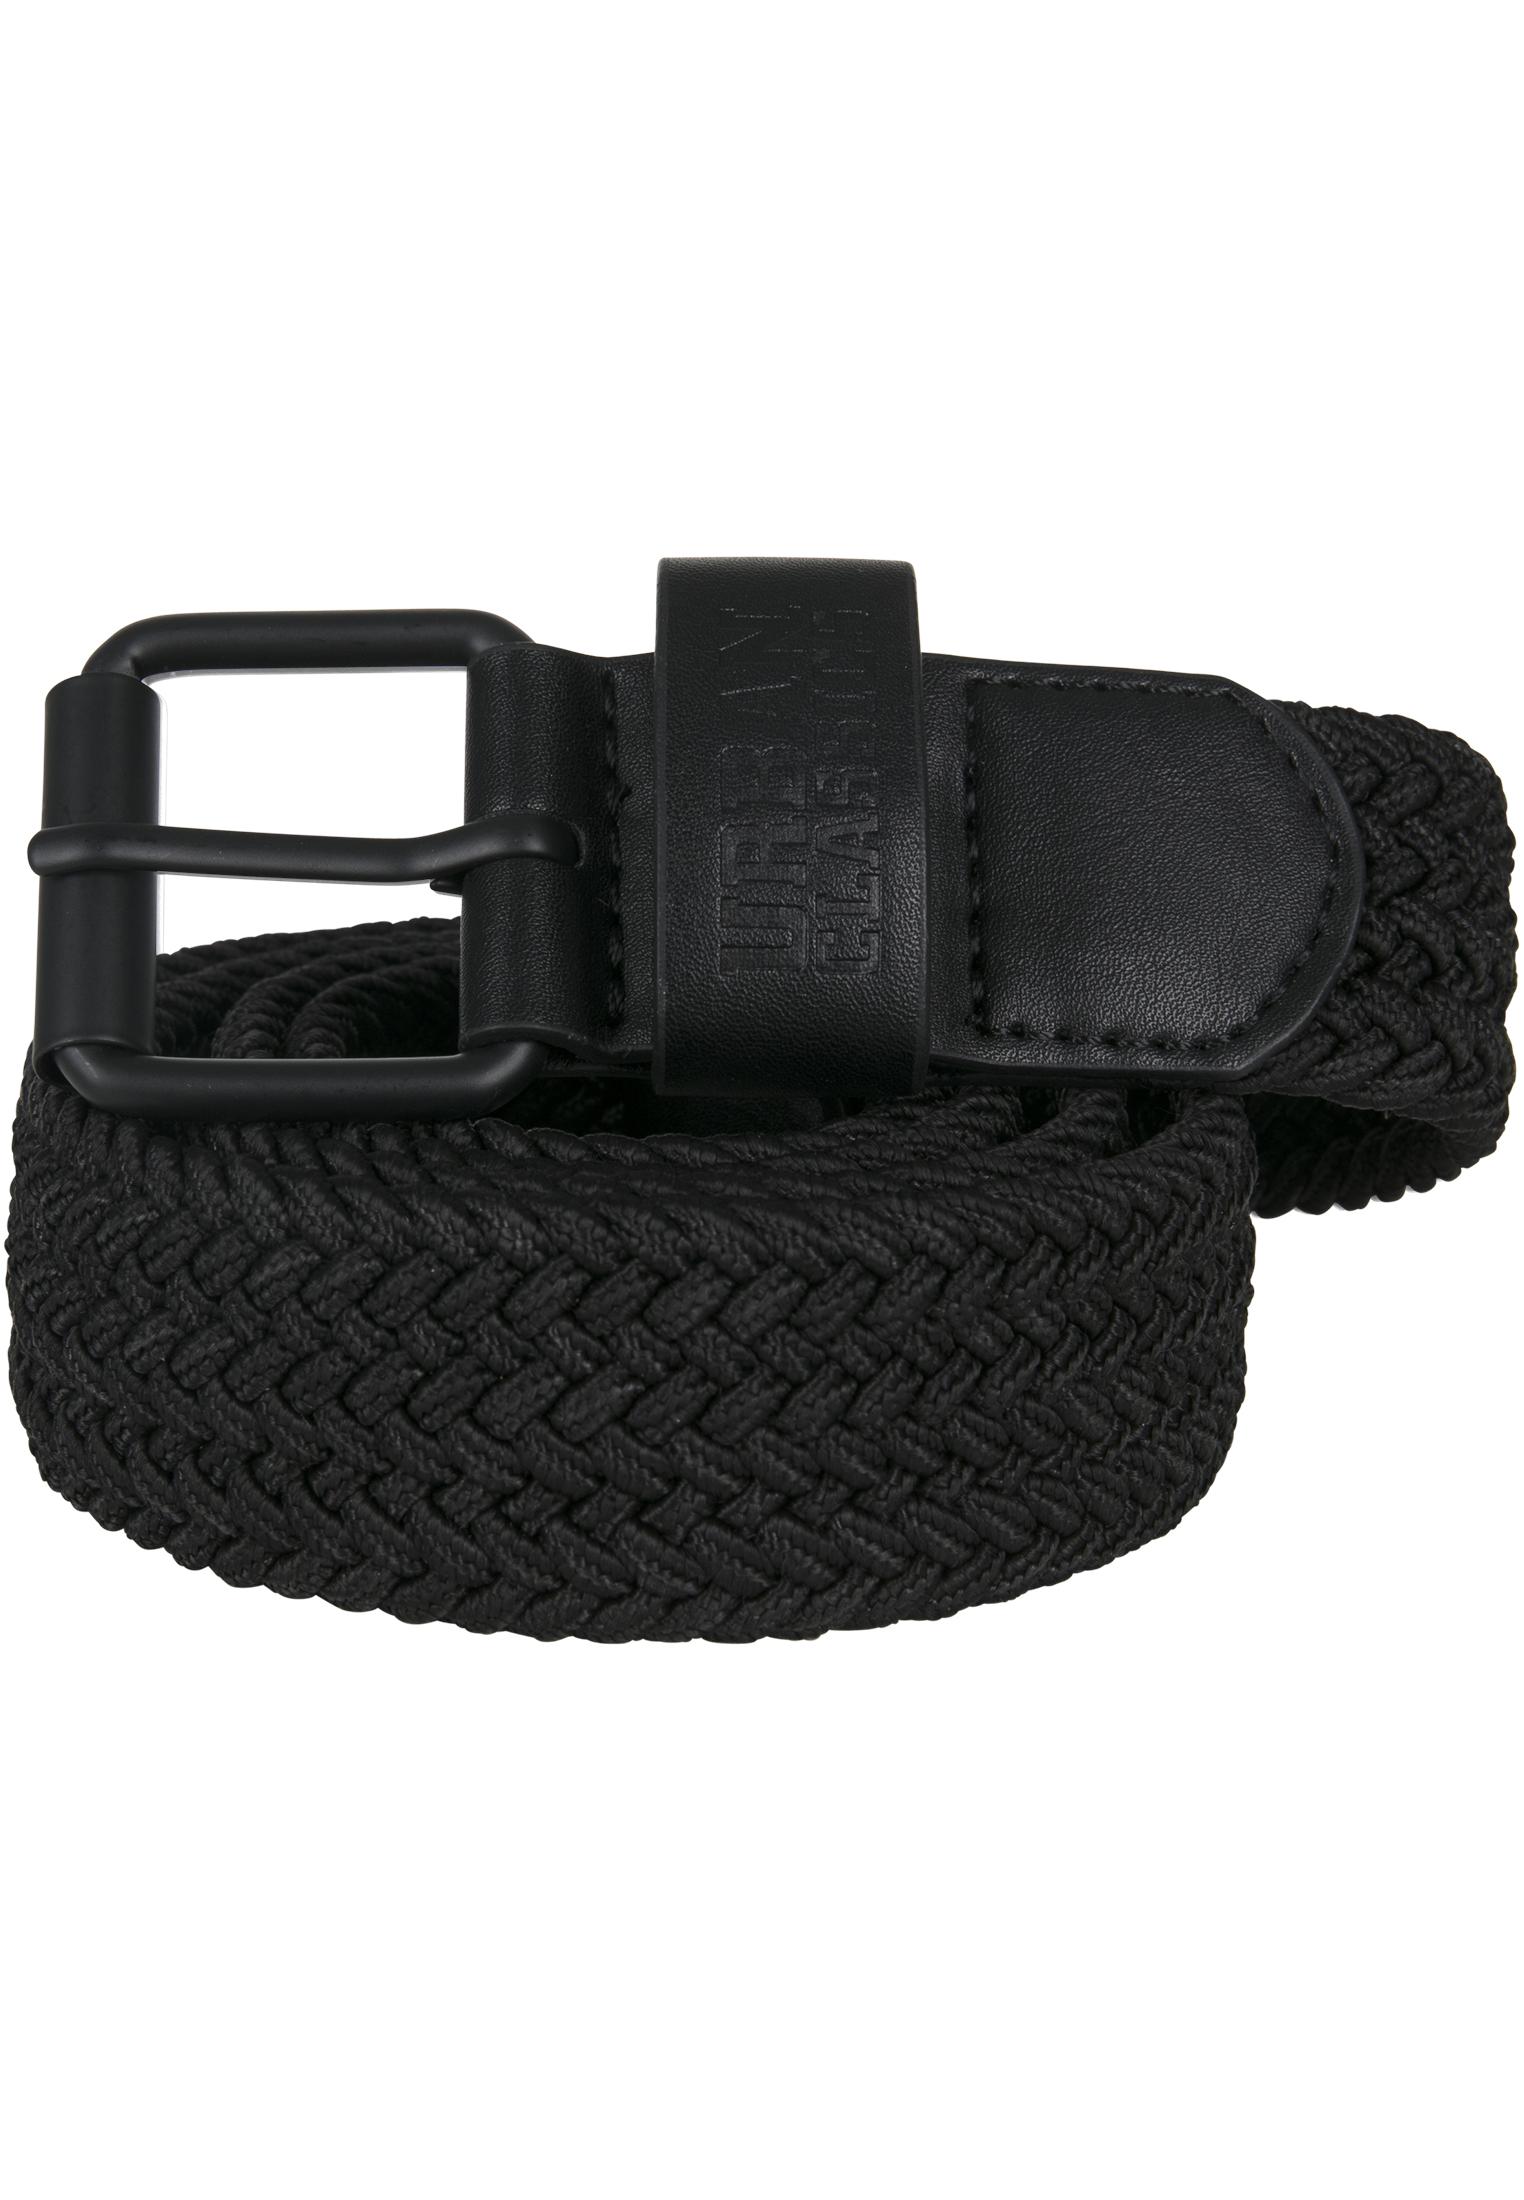 Urban-Classics-Herren-Guertel-casual-Leather-Imitation-Belt Indexbild 11